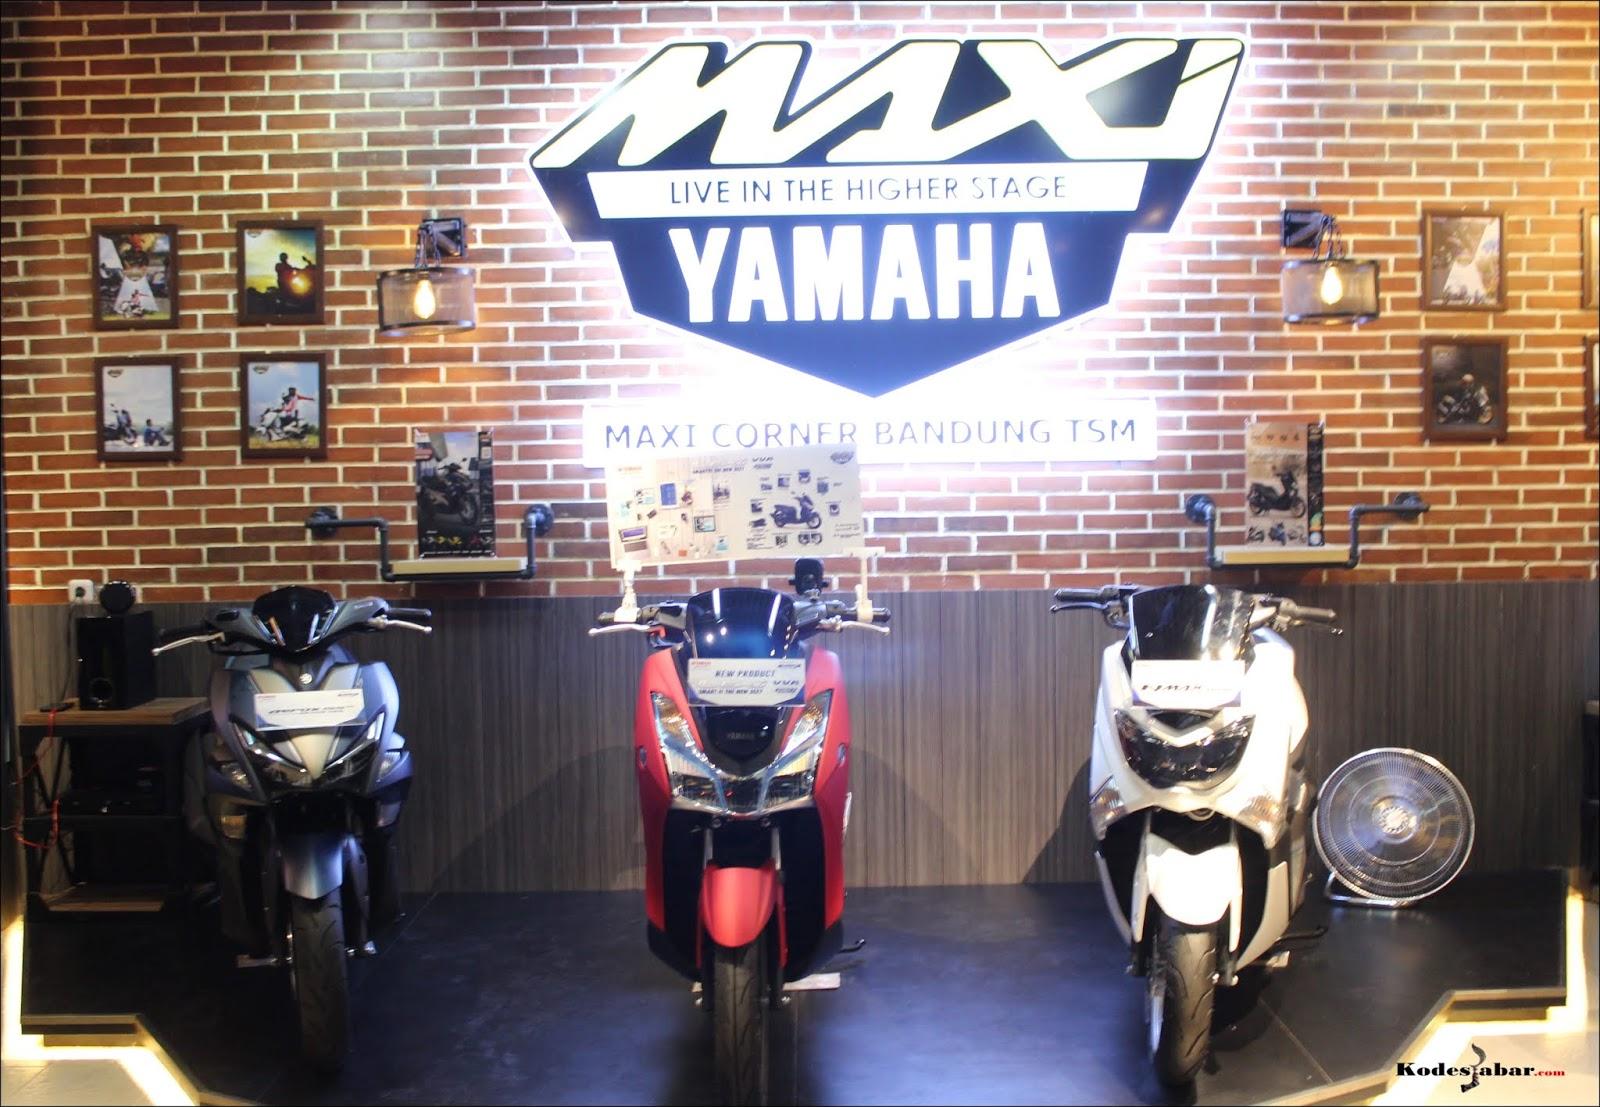 MAXI Corner Yamaha, Showroom Motor Kekinian di Trans Studio Mall Bandung